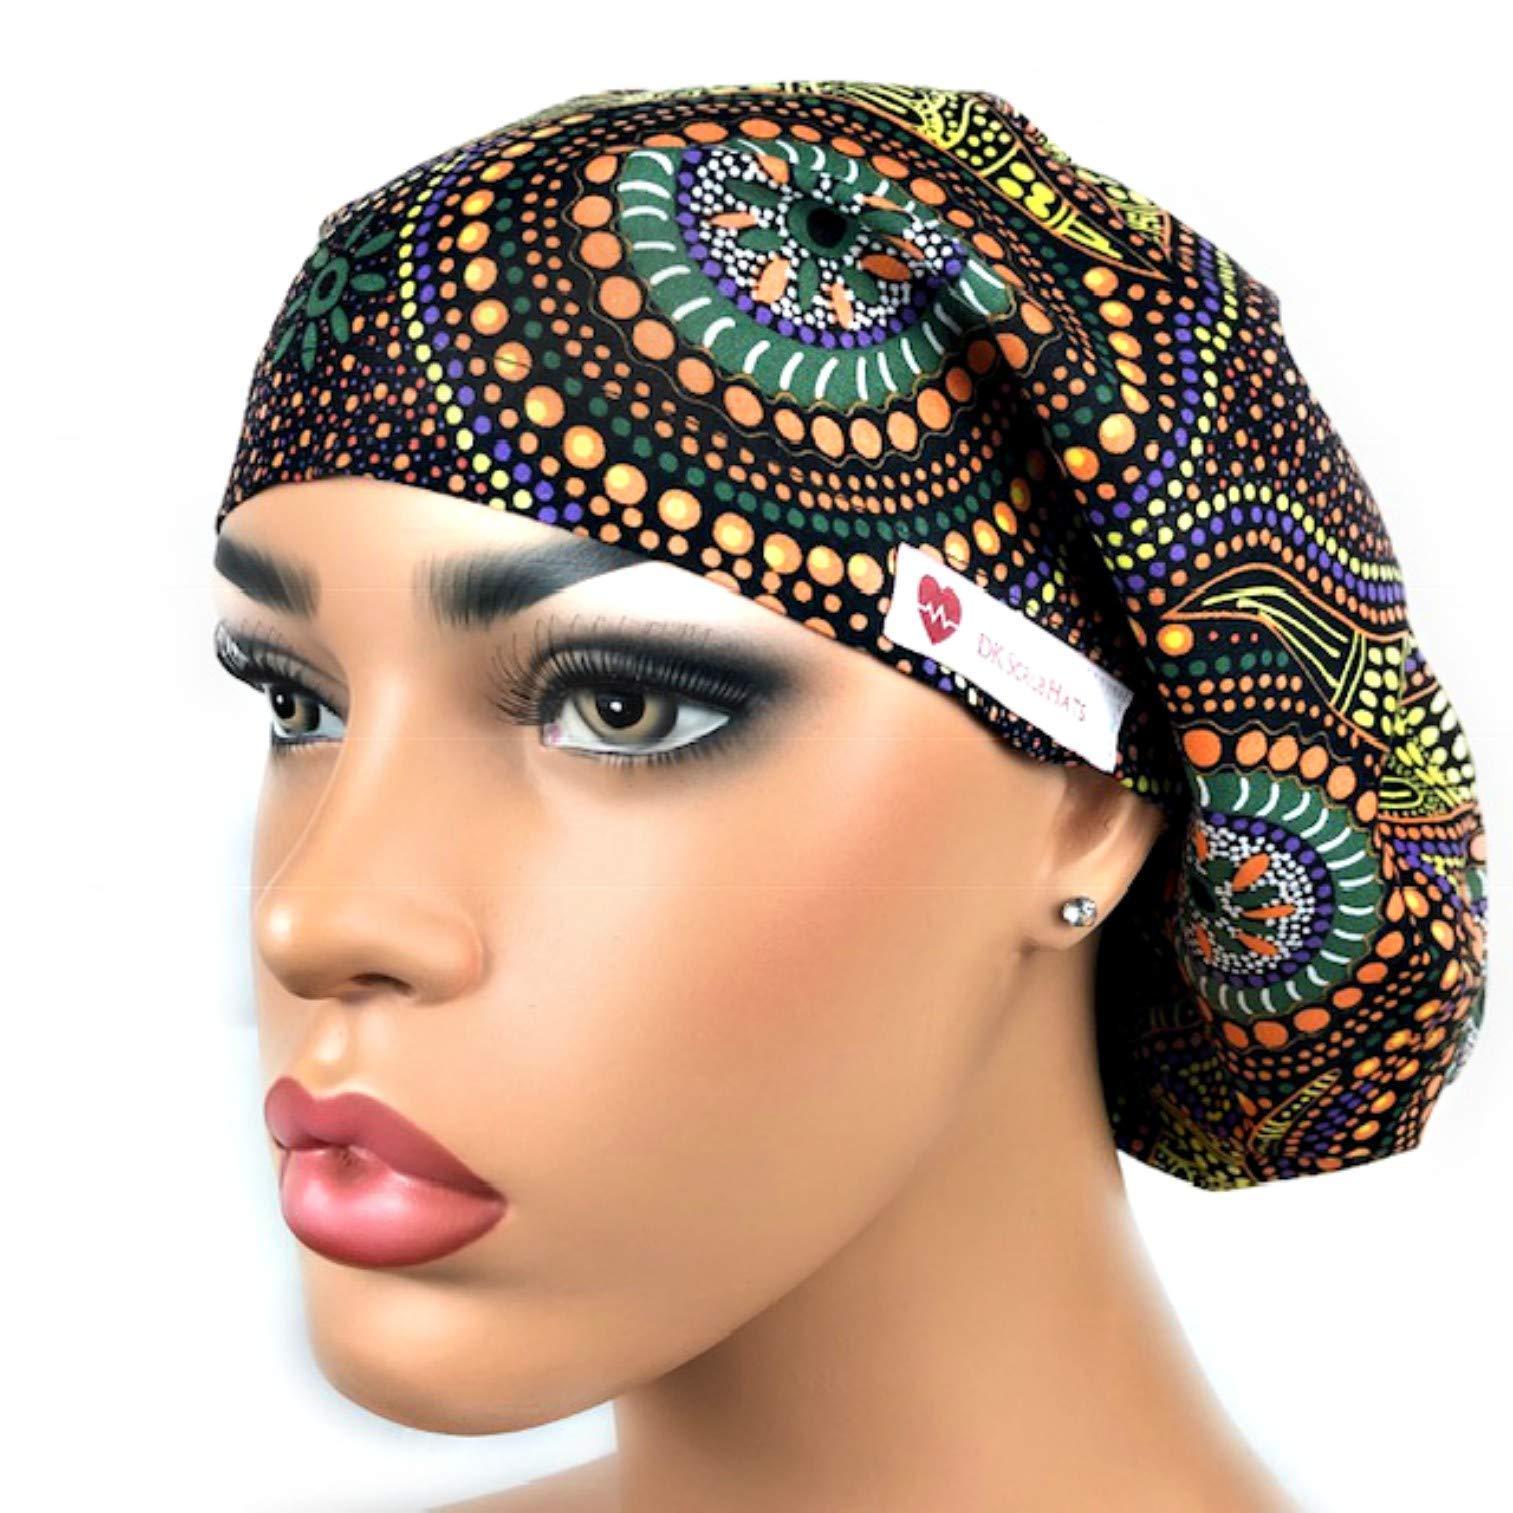 Women's Adjustable Bouffant Scrub Hat Ponytail Surgical Cap African Ankara Print by DK Scrub Hats